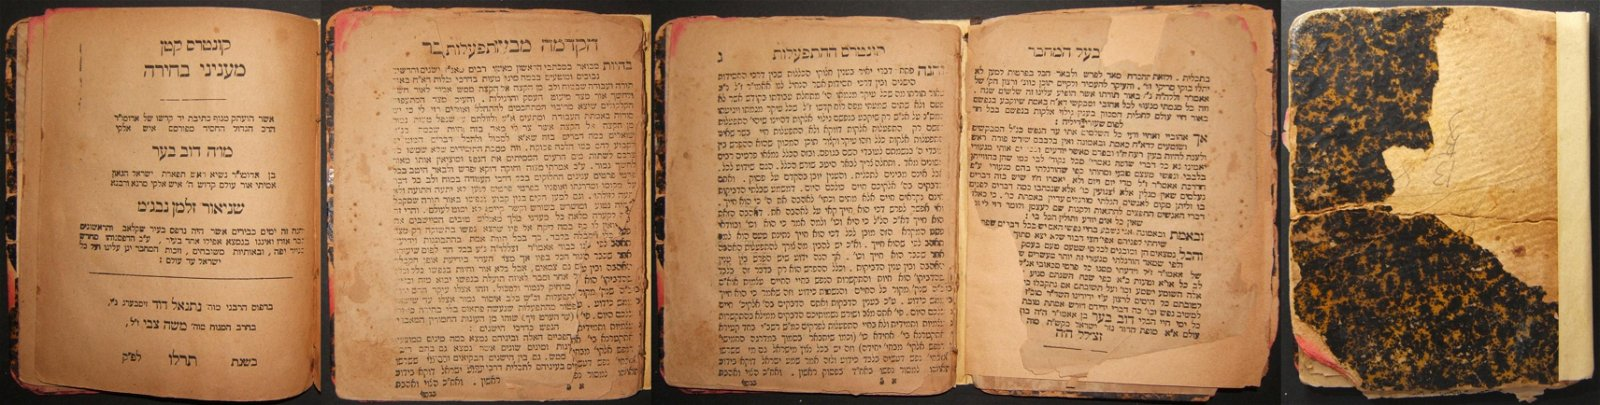 Chabad-Lubavitch Kuntres HaHitpaalut & MeInyanei